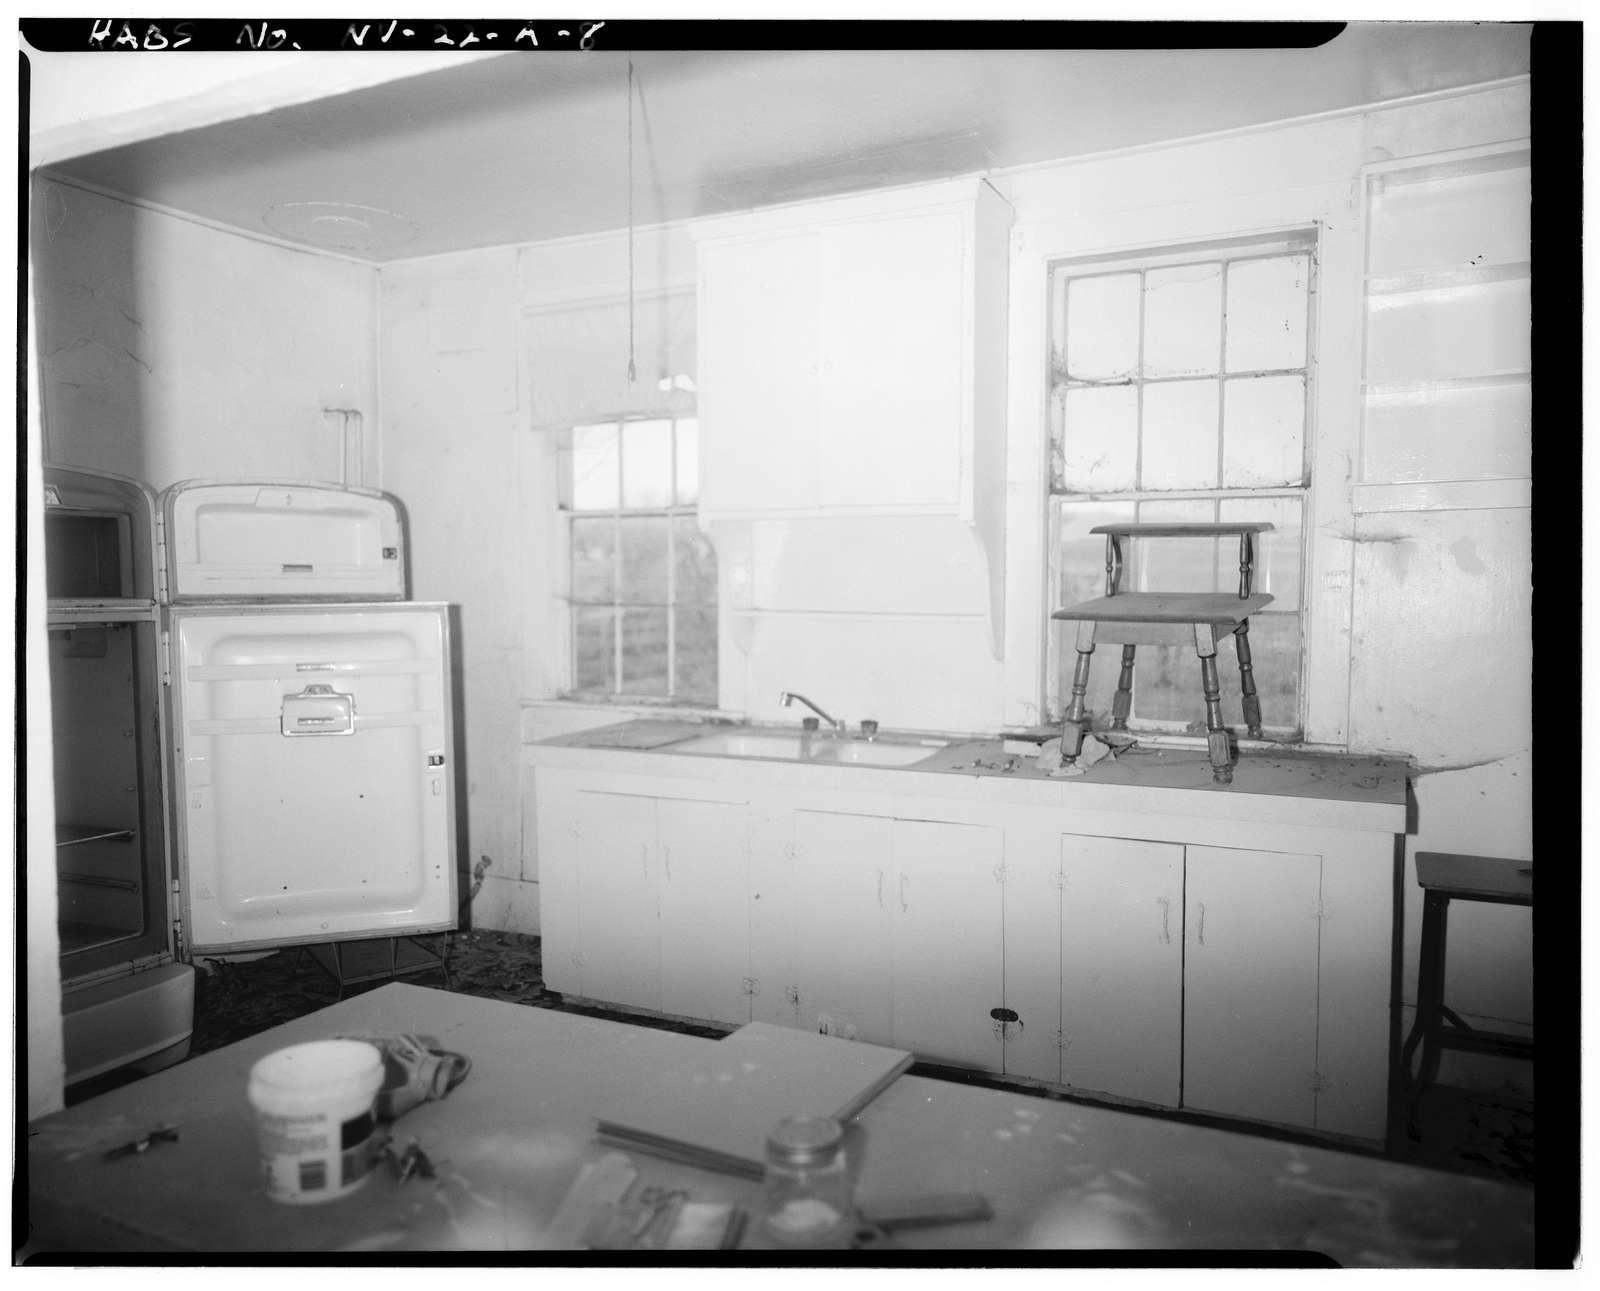 Peter Dalton Ranch, Dalton House, 9005 South Virginia Street, Reno, Washoe County, NV